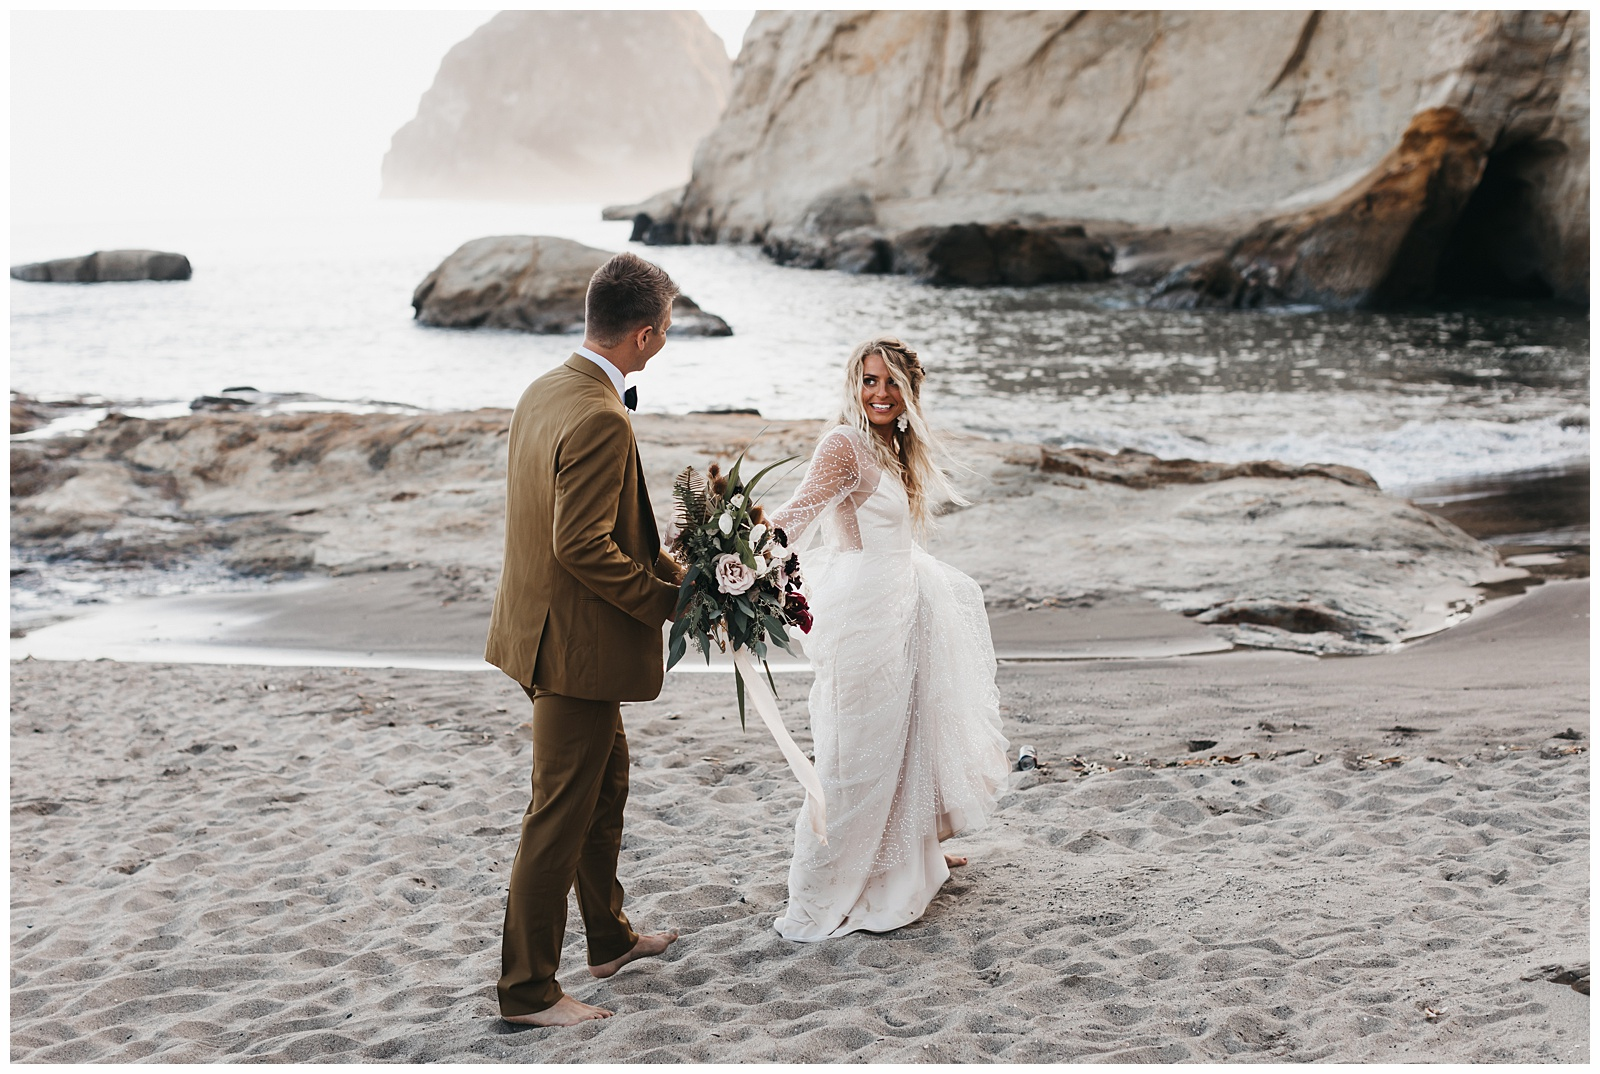 portland-wedding-photographer-pacific-city-elopement-photographer-anniezav_0060.jpg